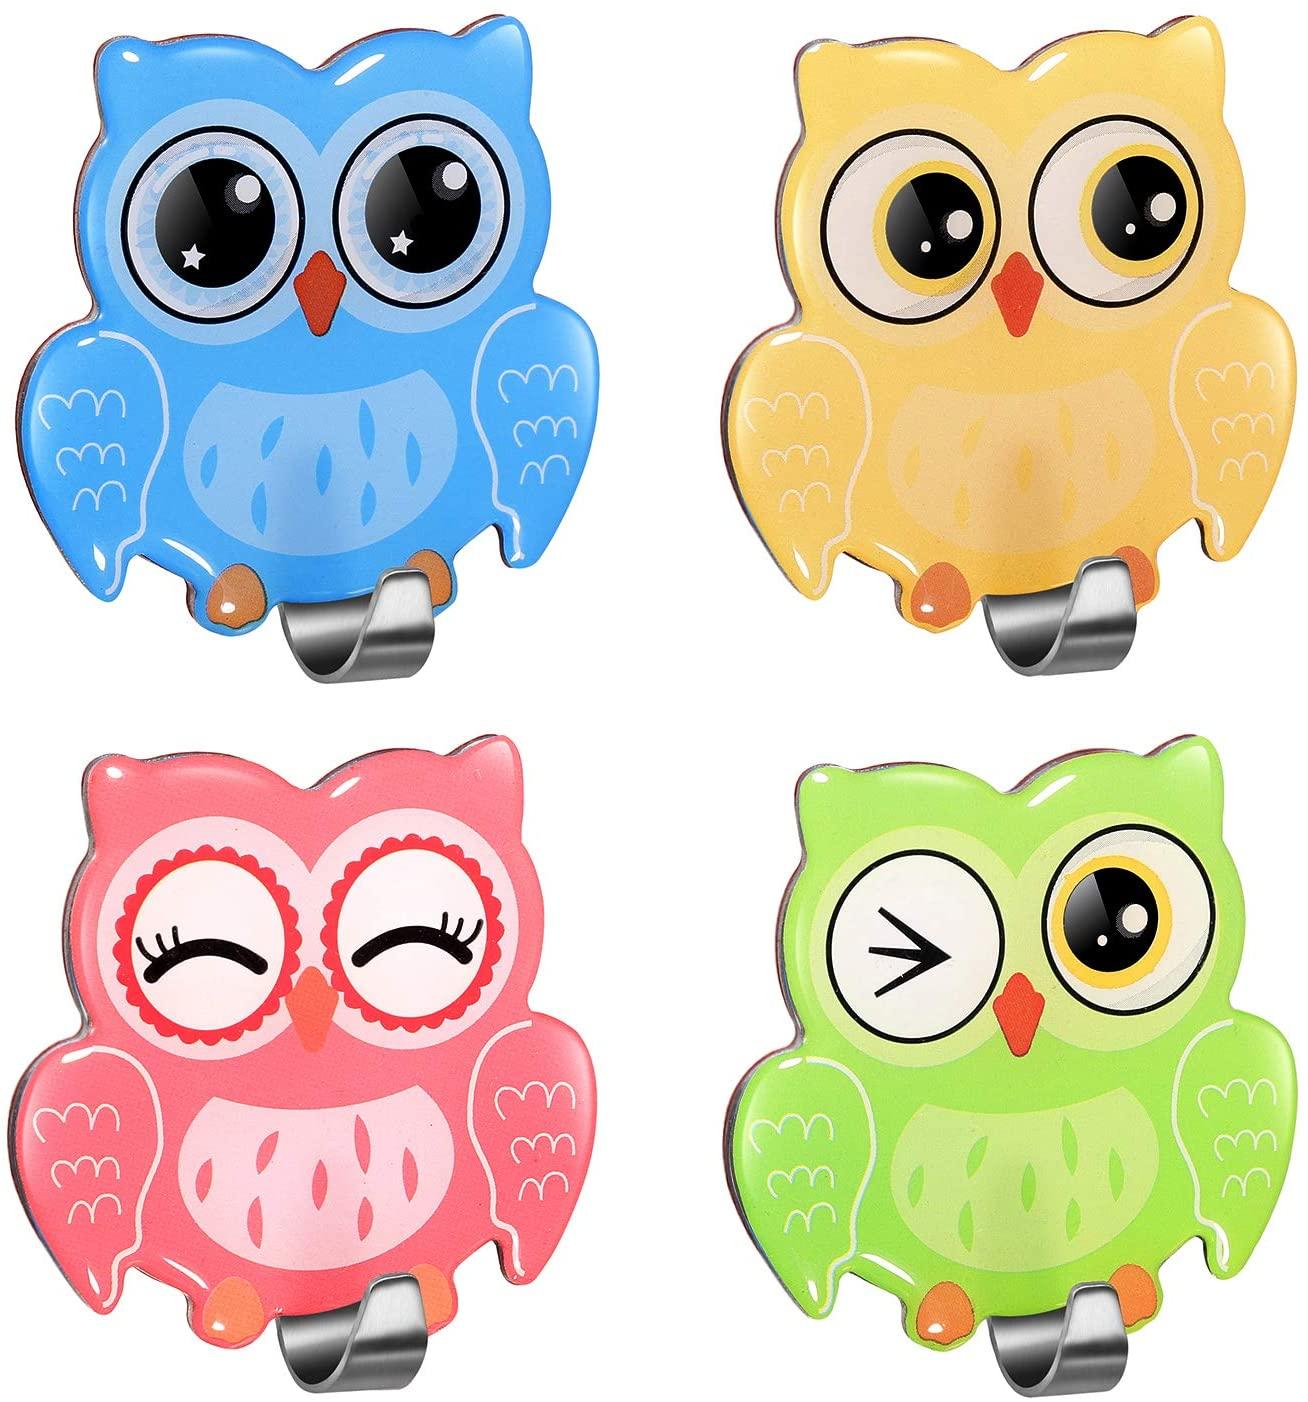 Adhesive Cute Owl Wall Hooks Heavy Duty Decorative Hanger for Boys and Girls Kids Bedroom Nursery, Coat Towel Key Hats Door(4 Pack)